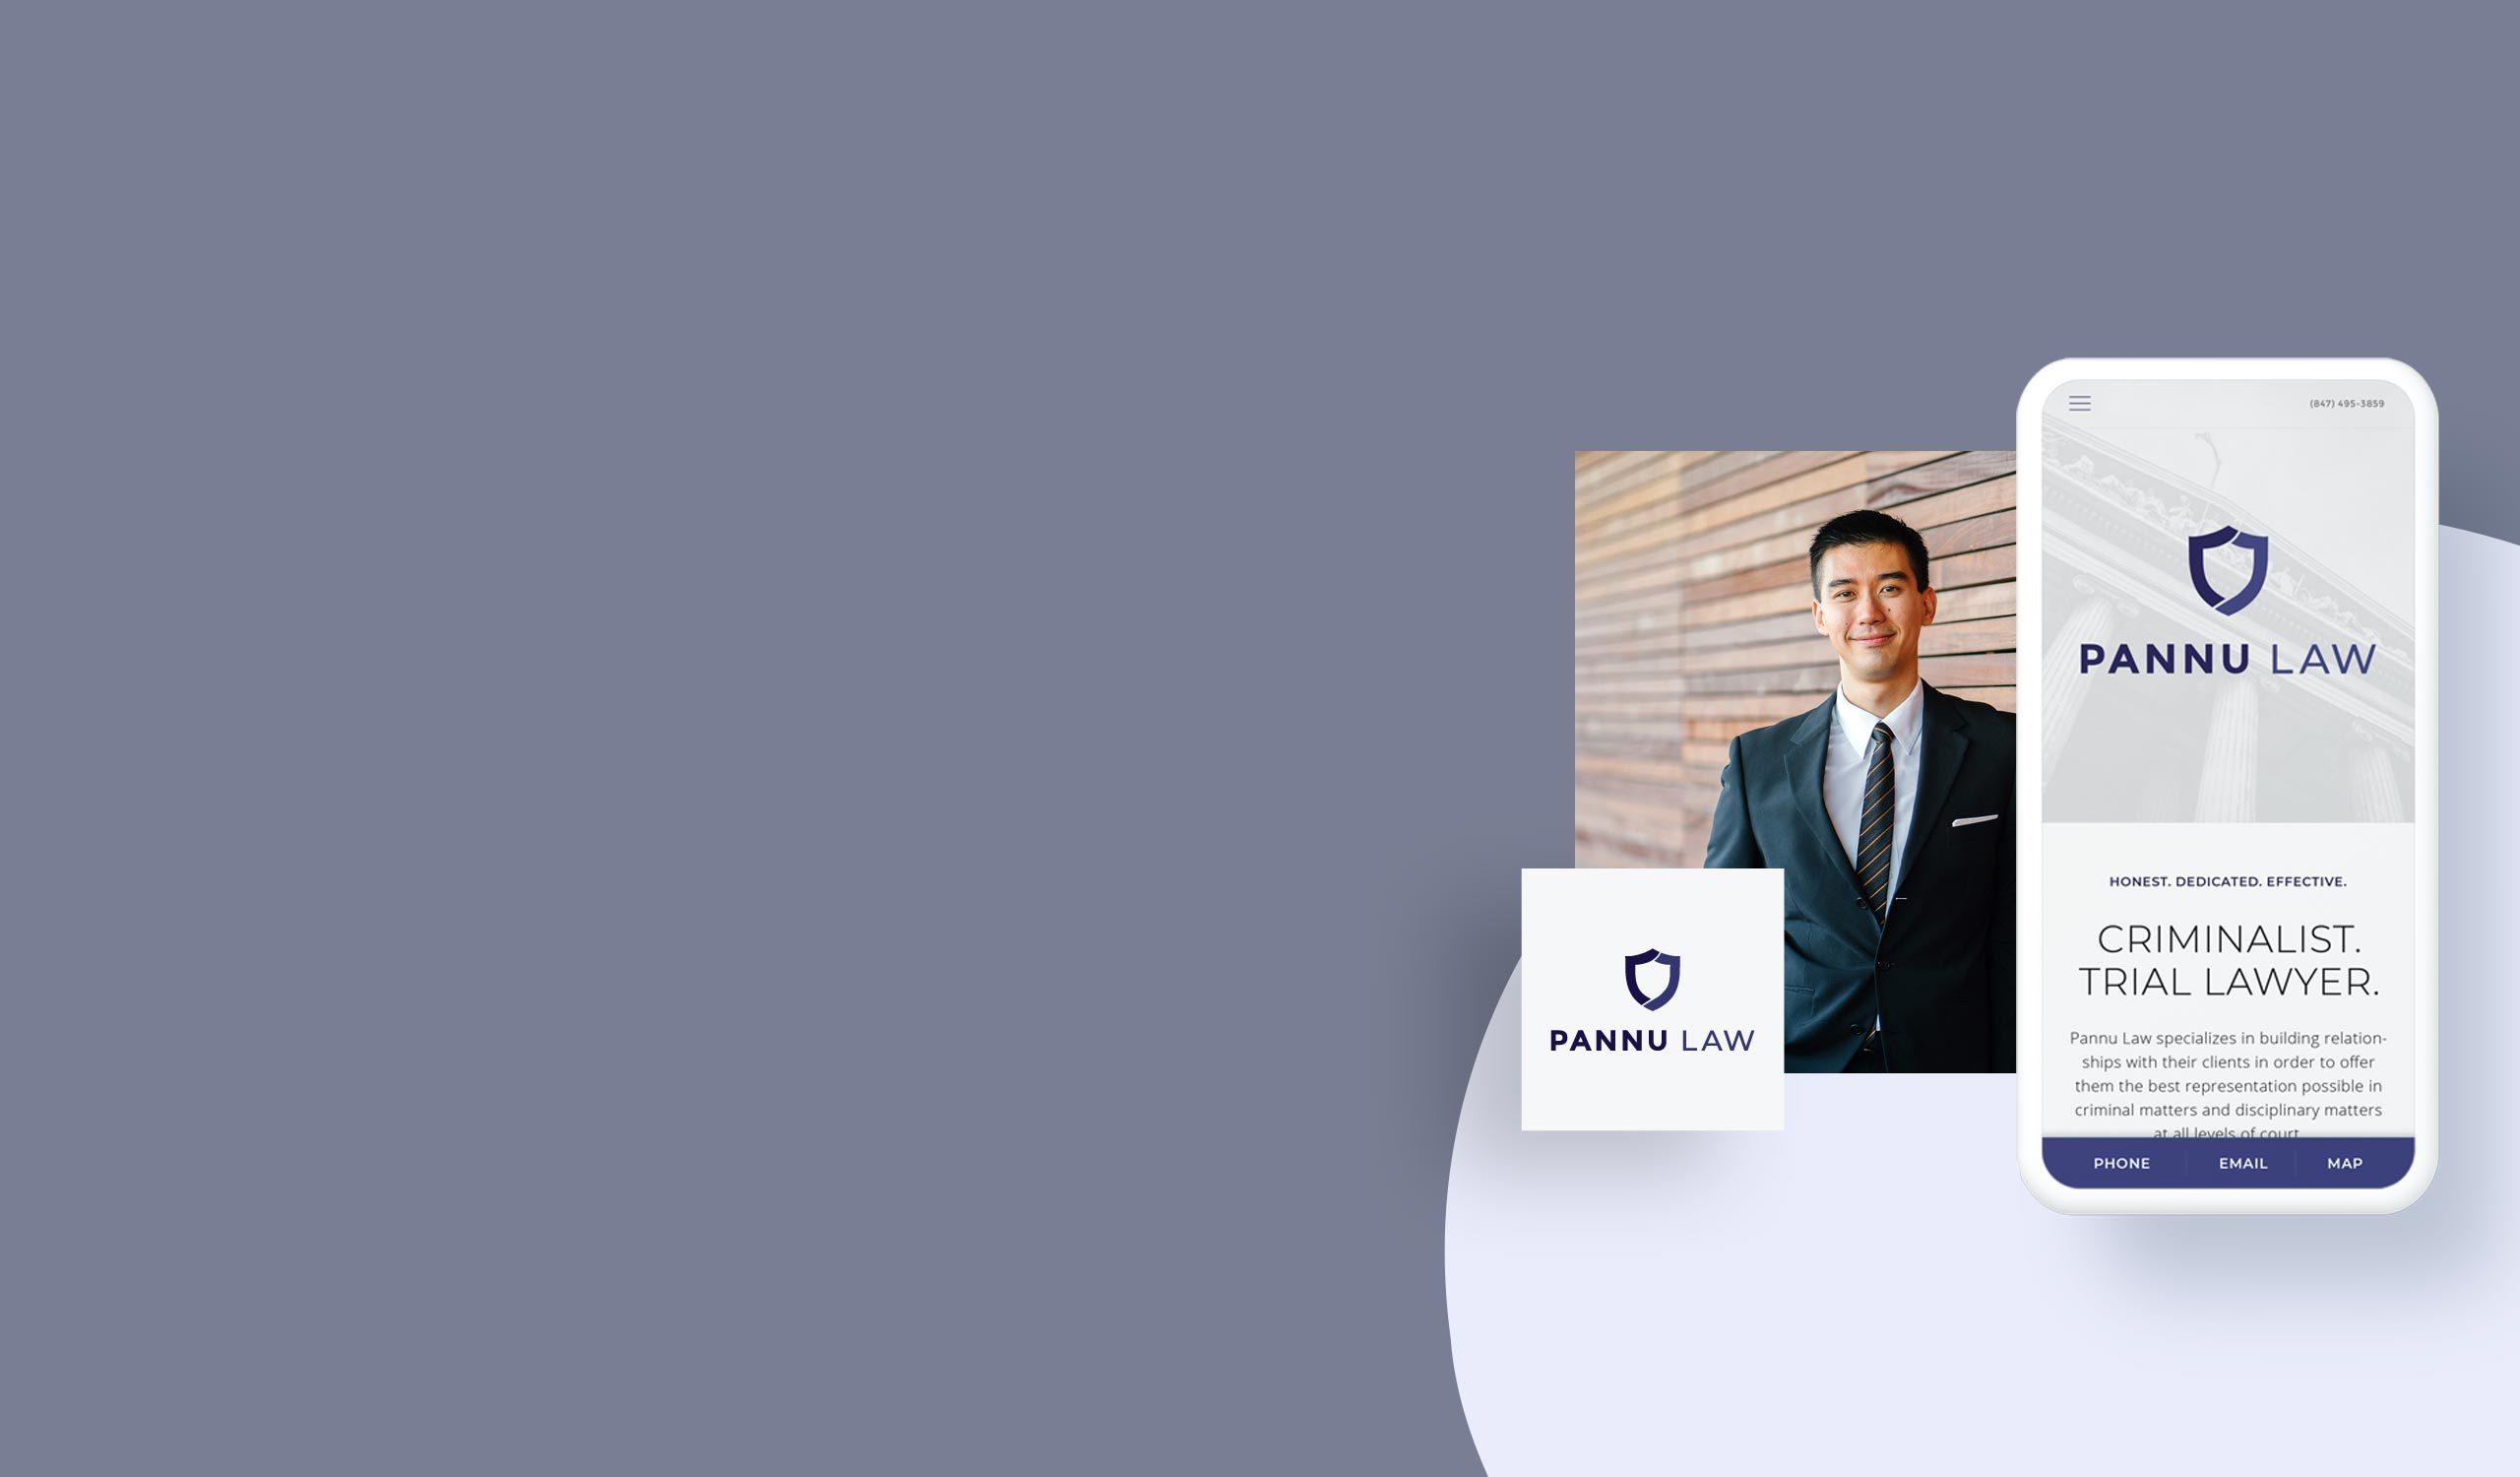 best logo design for lawyers lockup of mobile website and custom logo